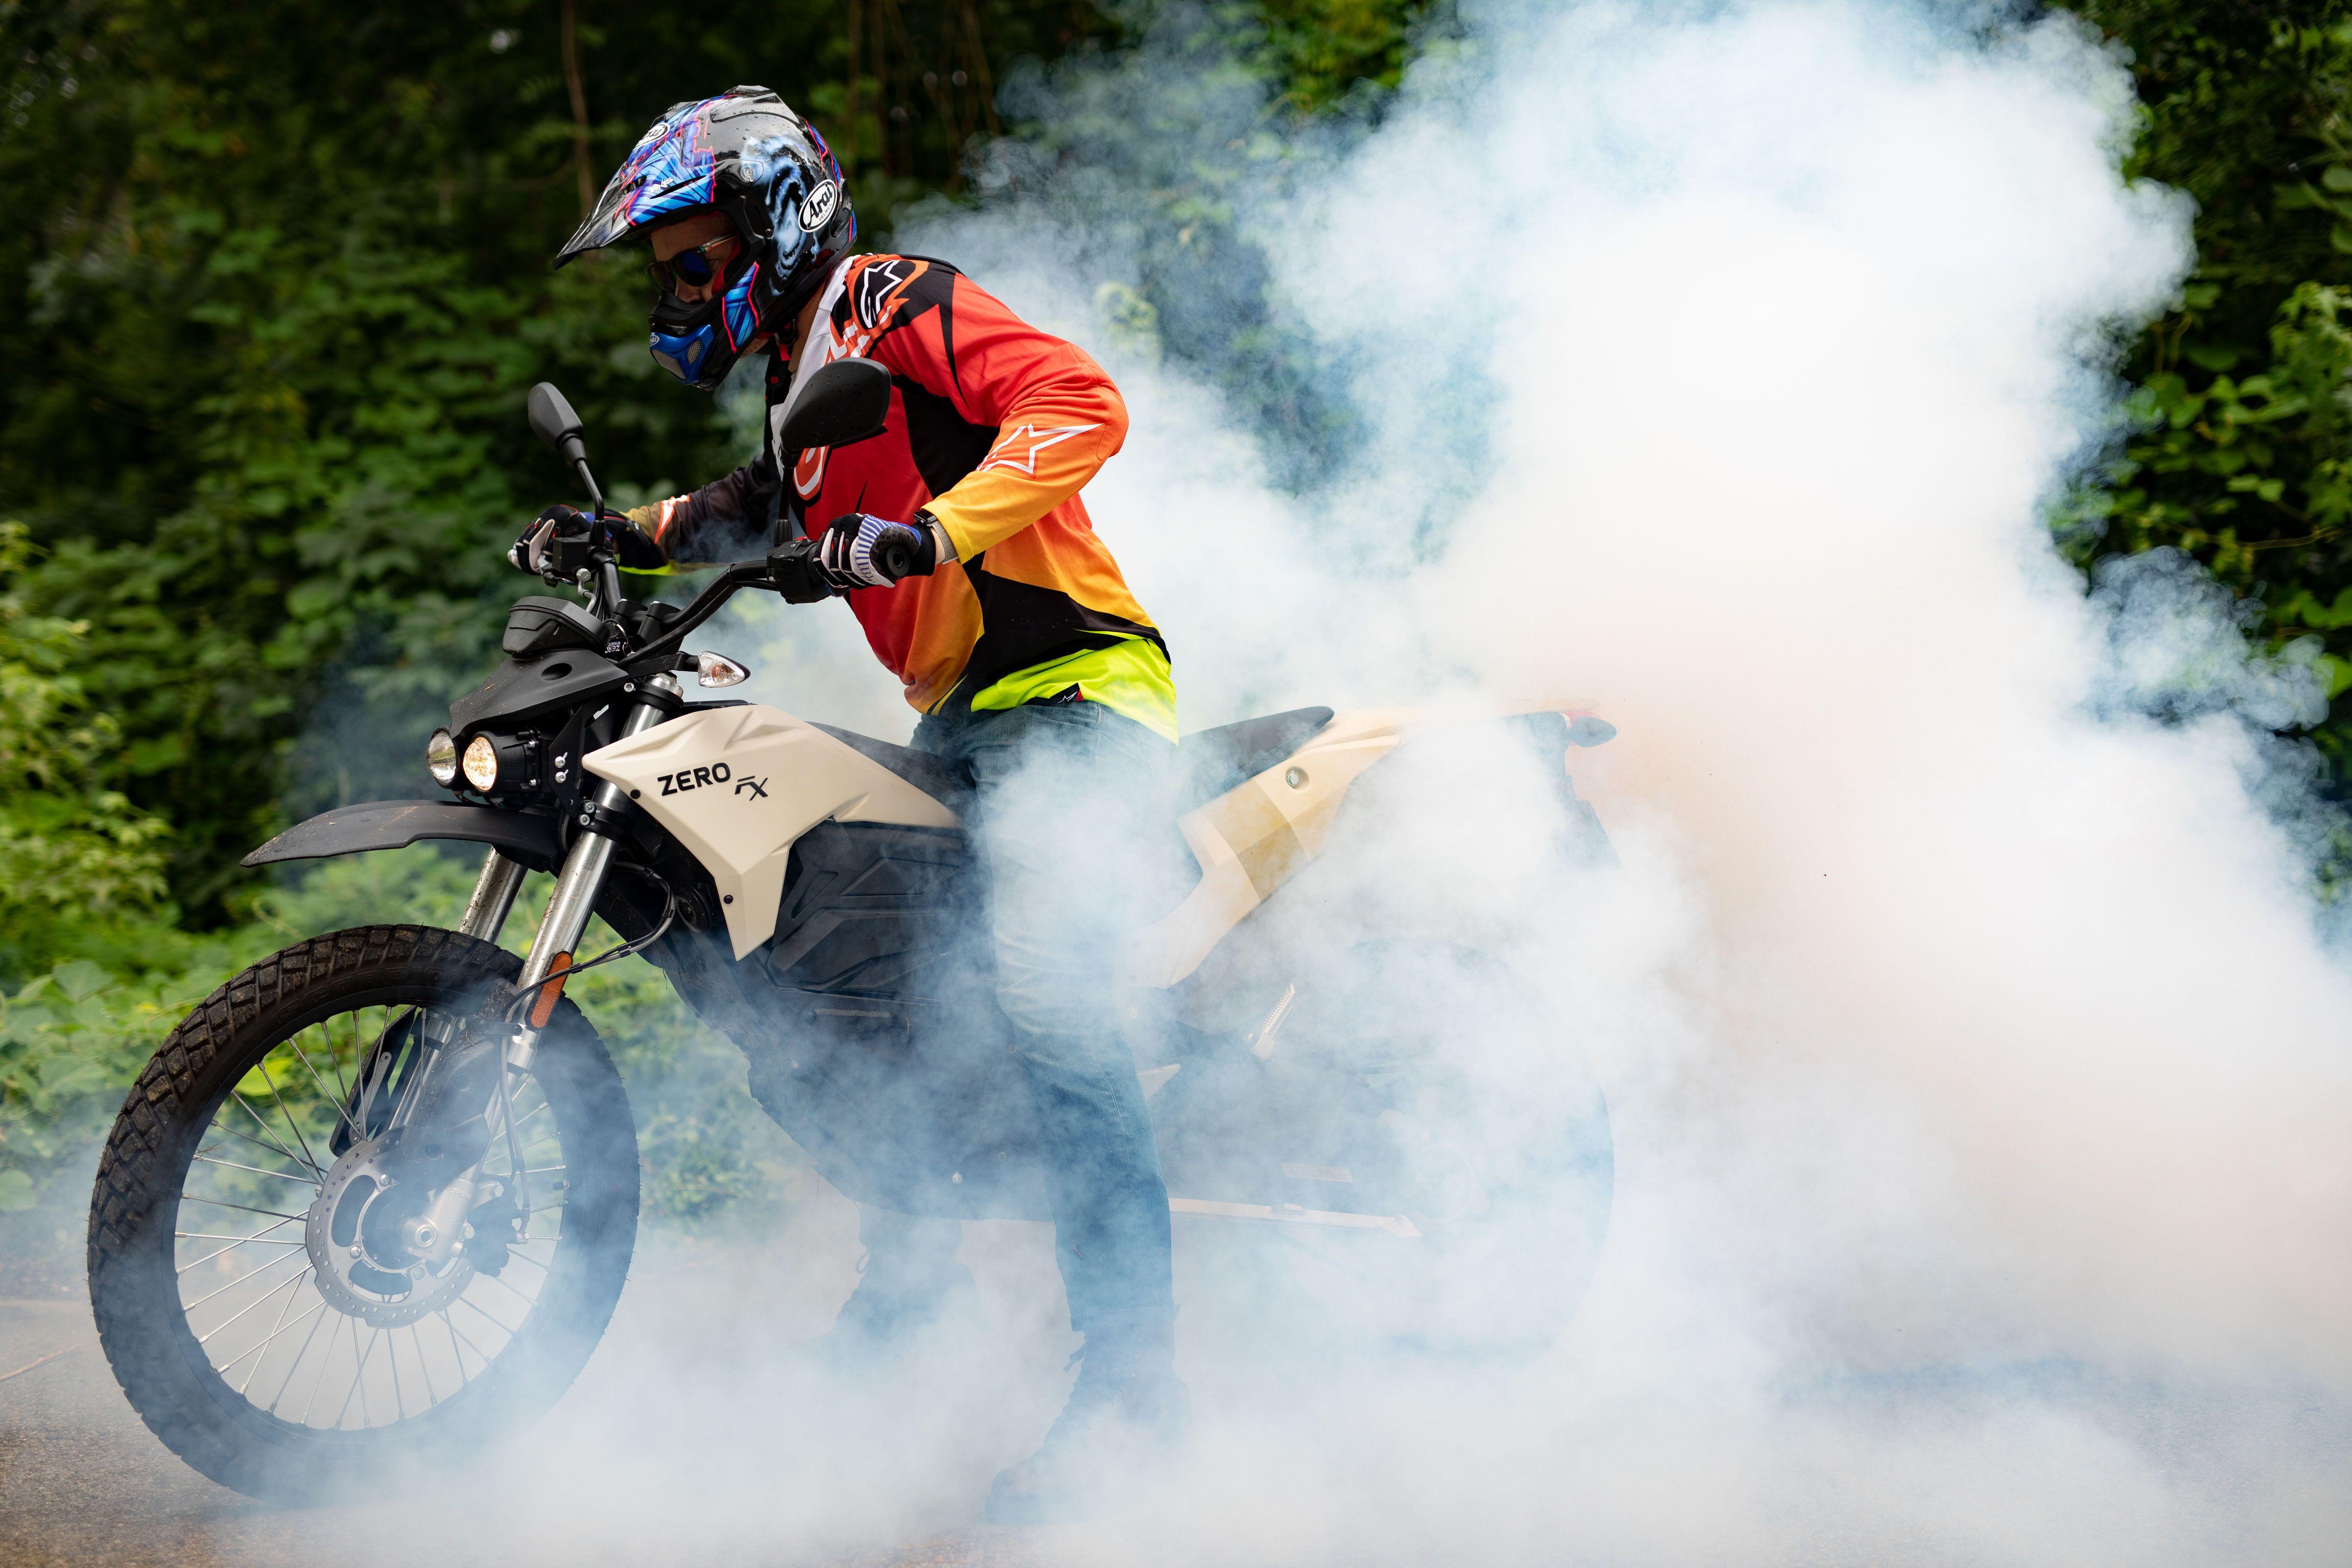 The Zero FX: The Amazing Silent Speedy Electric Dirt Bike